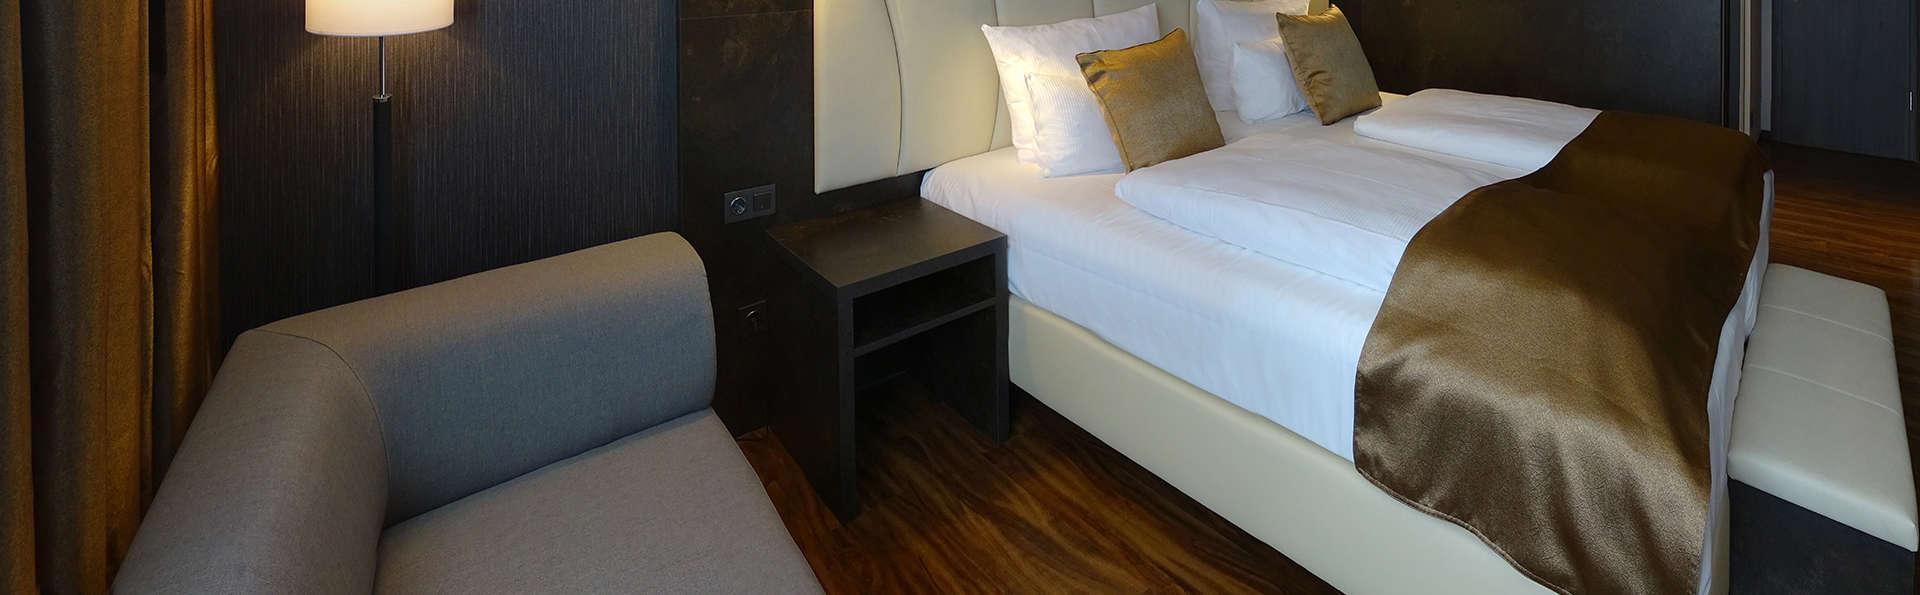 Best Western Plus Plaza Hotel Darmstadt - EDIT_NEW_Suite5.jpg